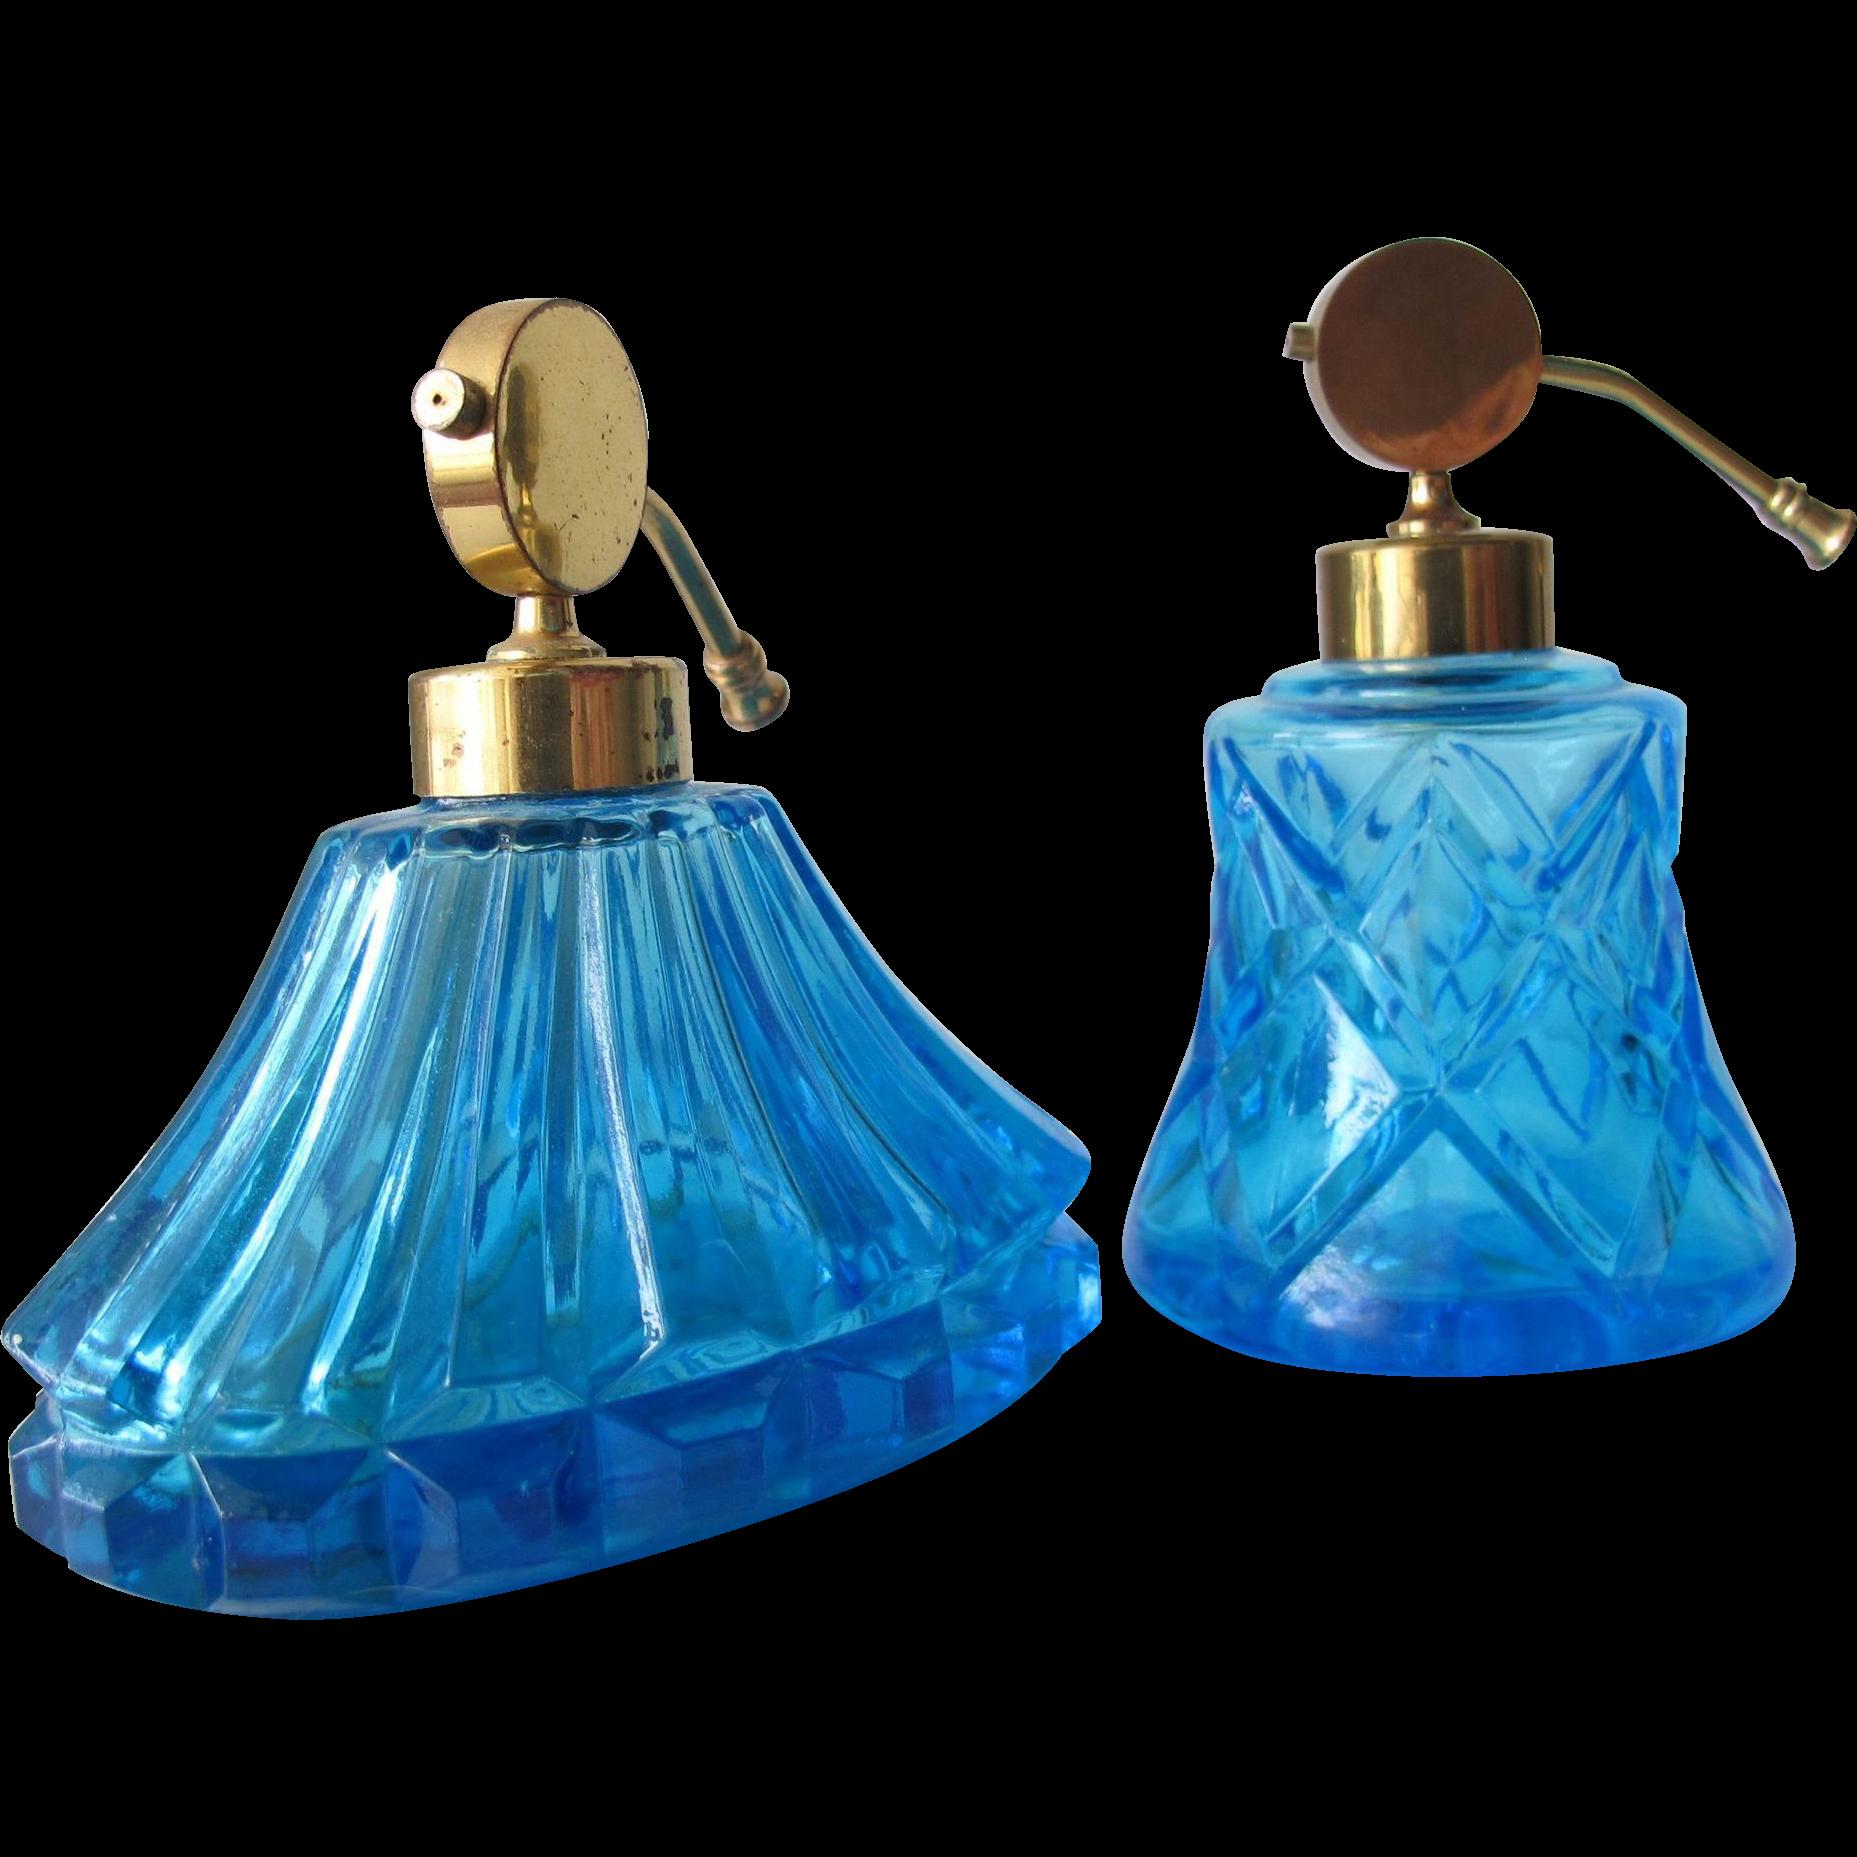 Turquoise Perfume Bottle Atomizers Irice Marked